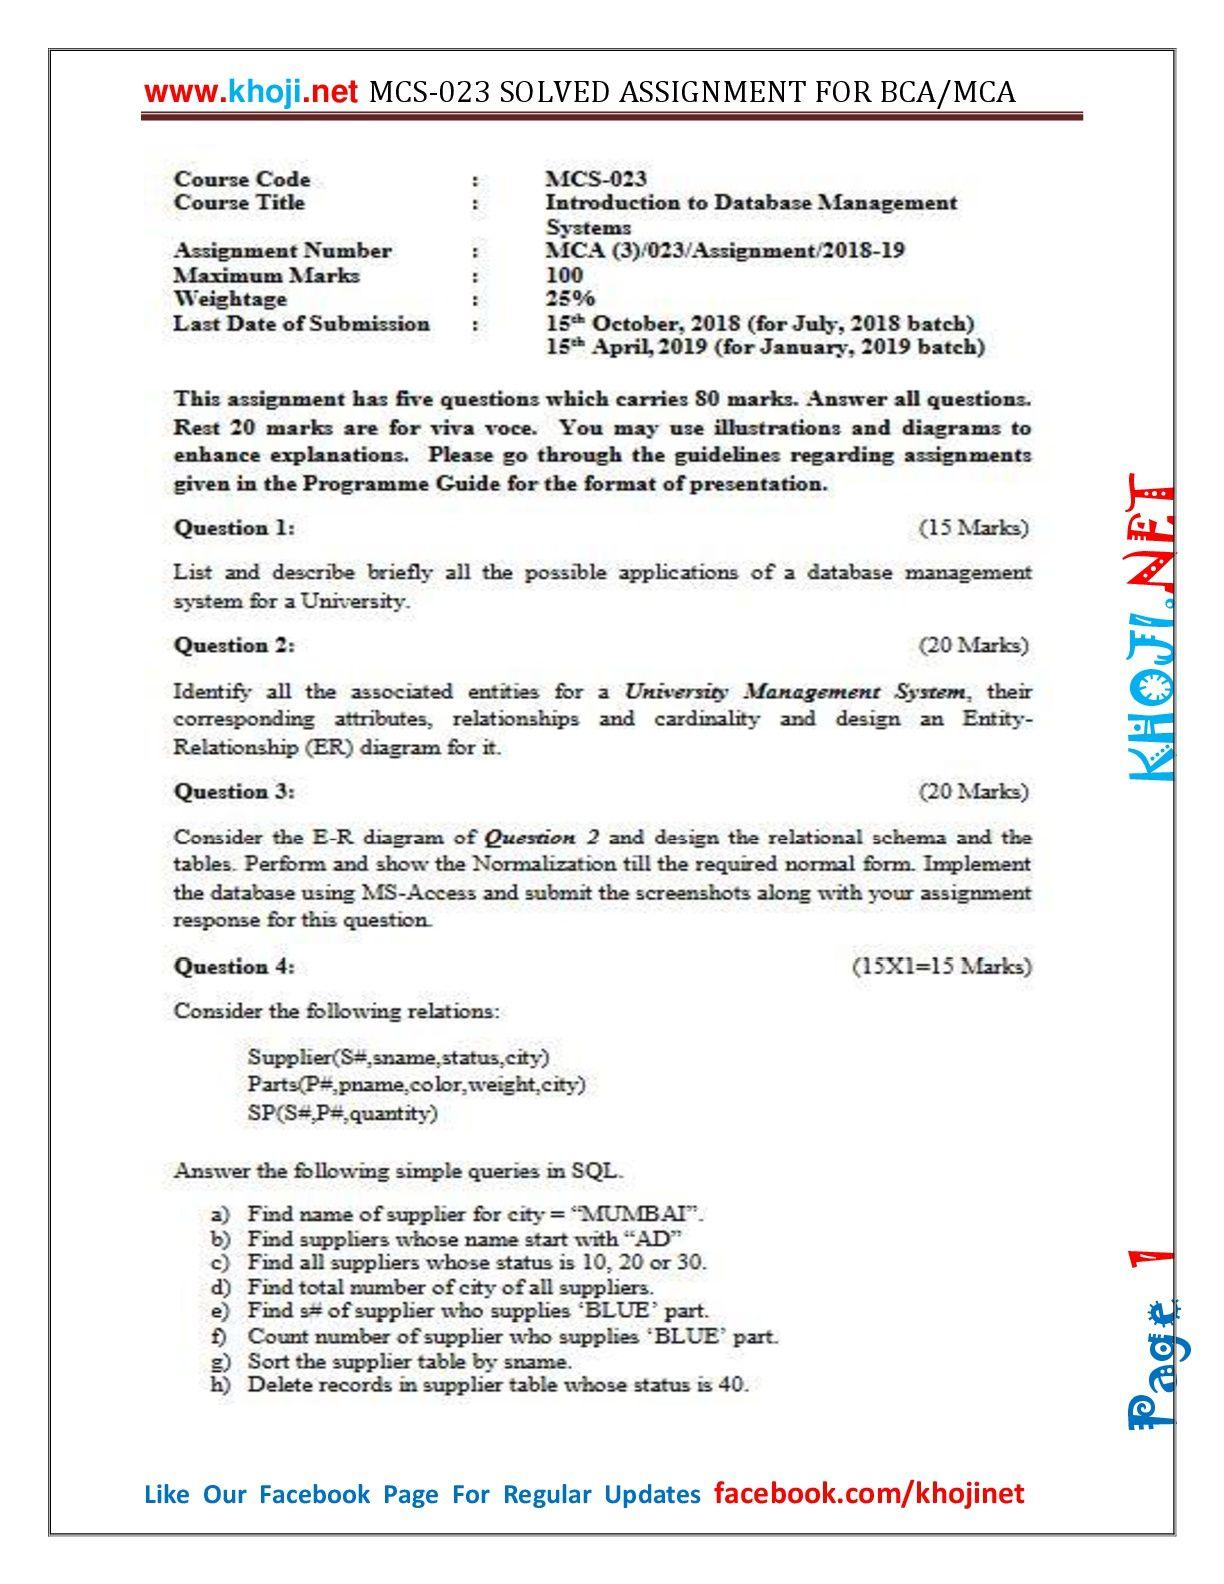 MCS-023 Solved Assignment 2018-19 IGNOU MCA BCA in PDF